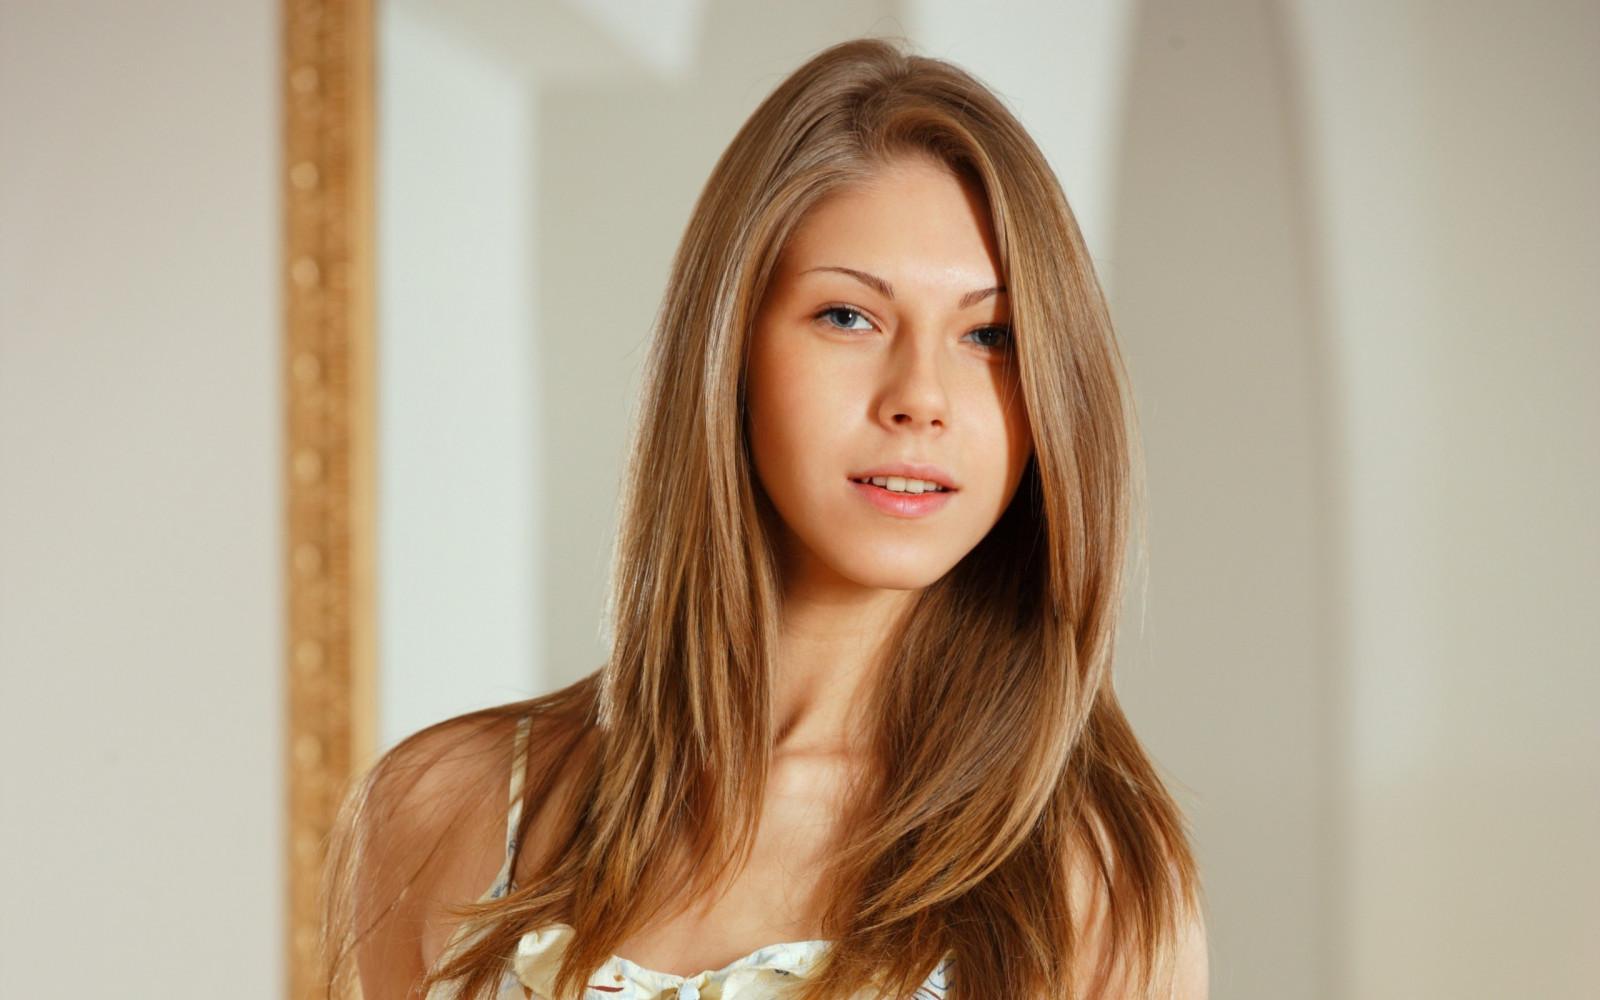 Wallpaper Face Model Blonde Long Hair Blue Eyes: Wallpaper : Face, Women, Model, Blonde, Long Hair, Blue